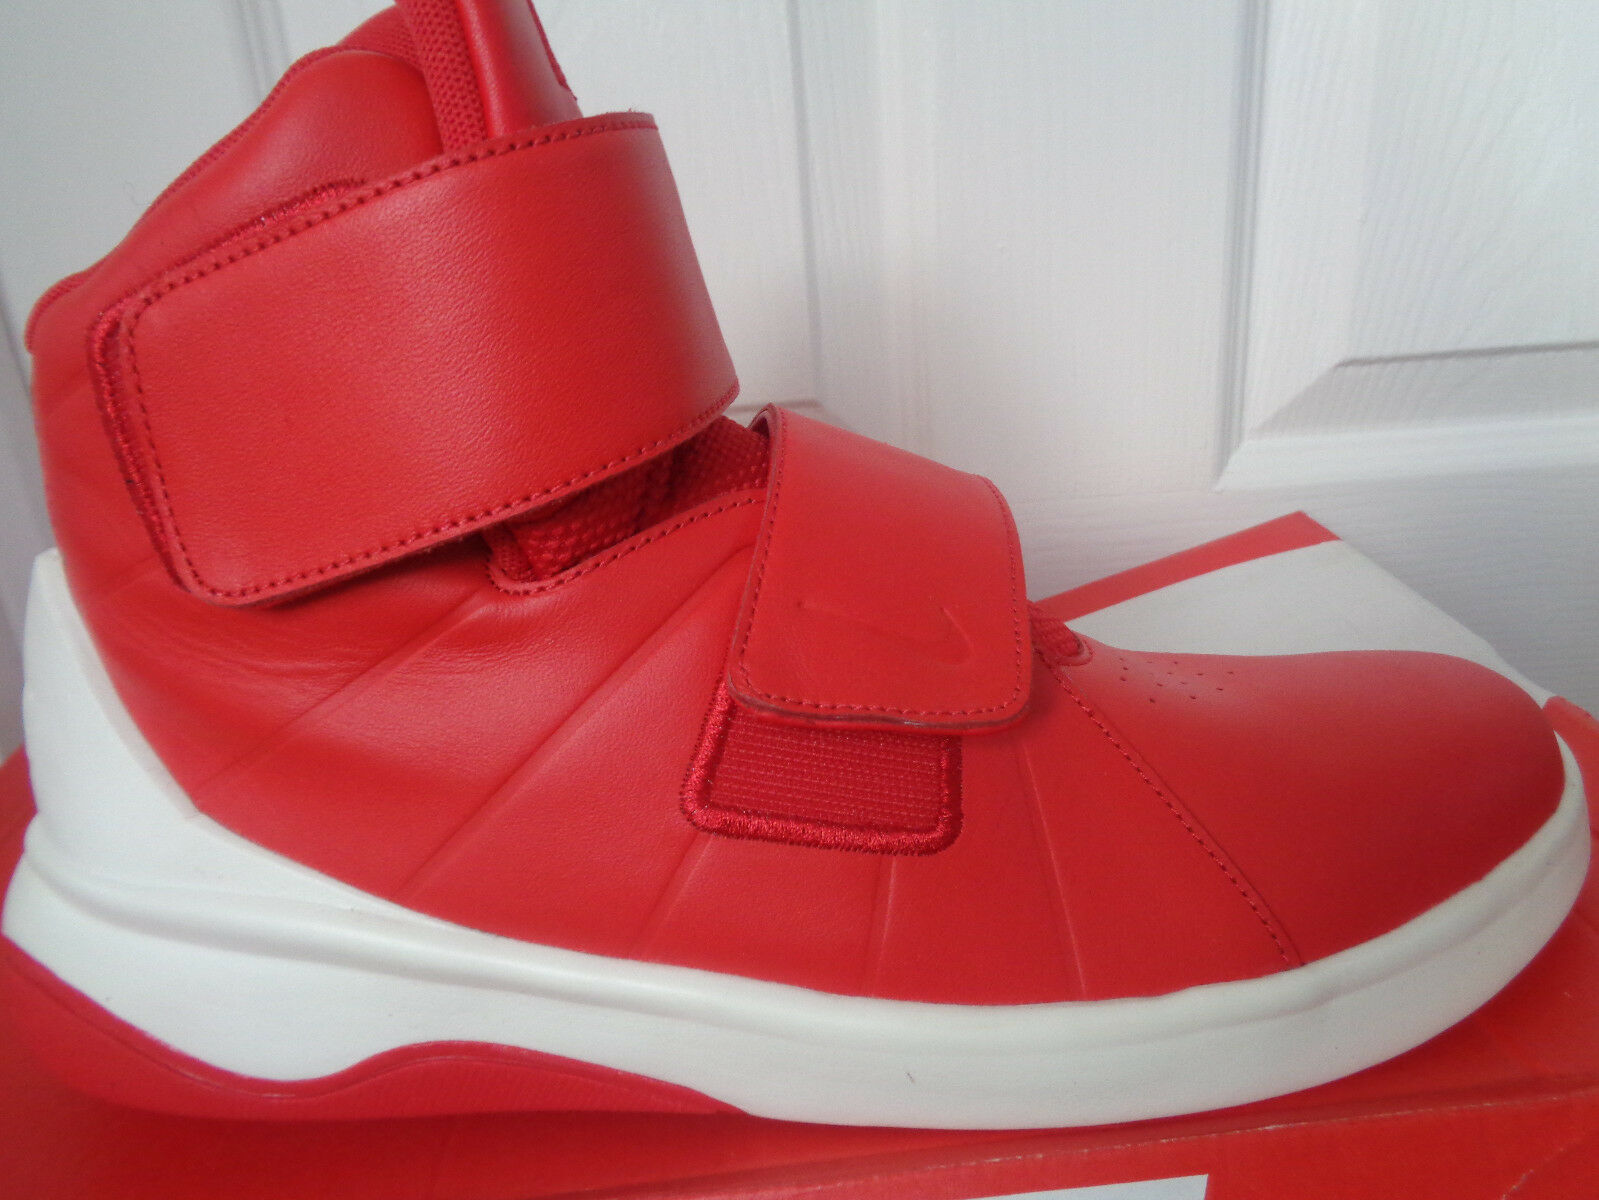 Nike Marxman Para hombre Bota Negro blancoo 832764 600 UK 9 EU 44 nos 10 Nuevo + Caja